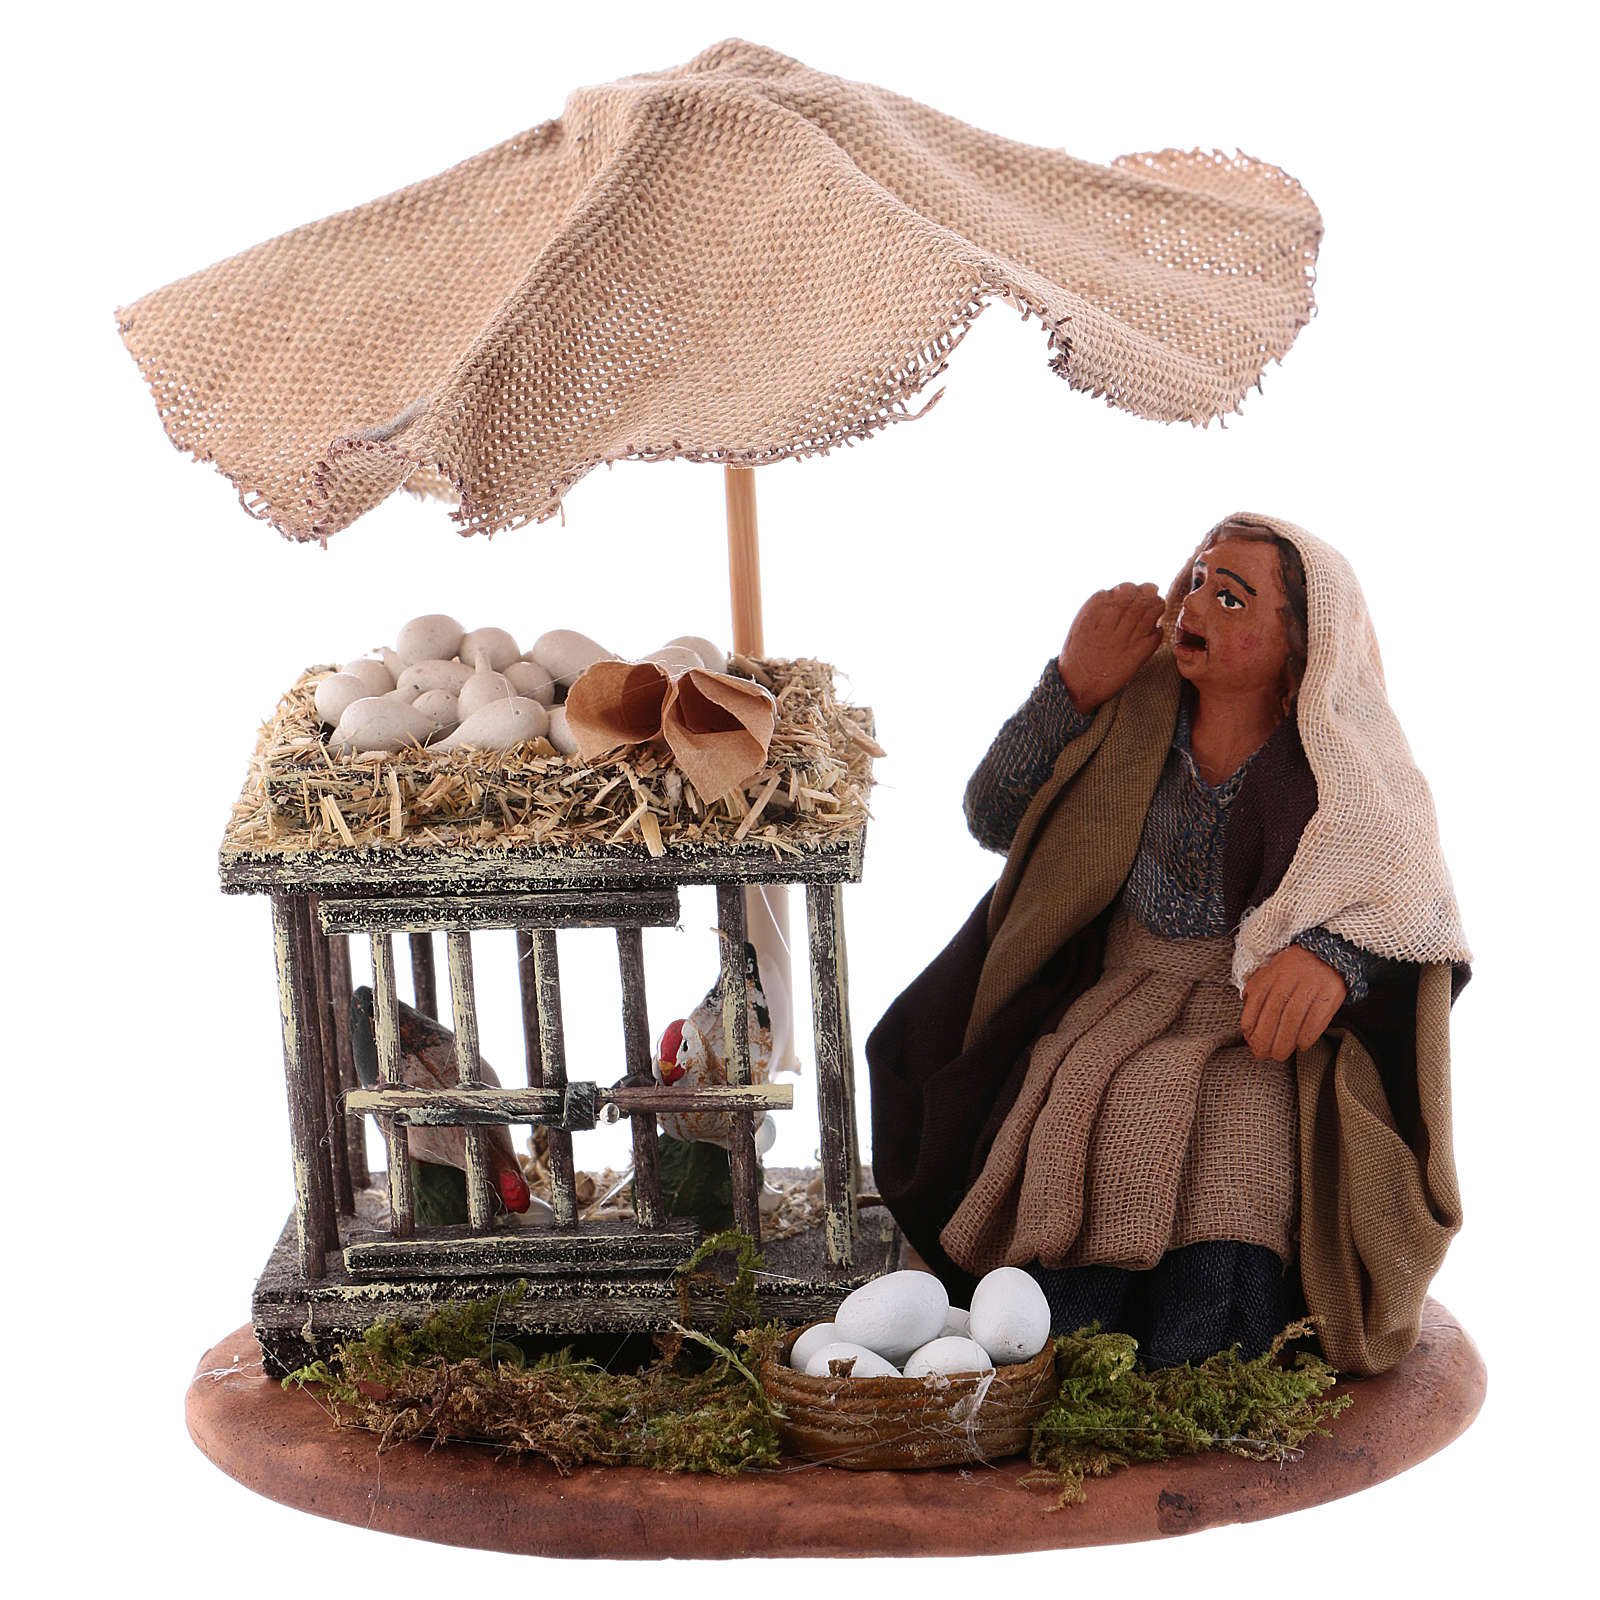 Mujer sentada con huevos 10 cm Belén Napolitano 4